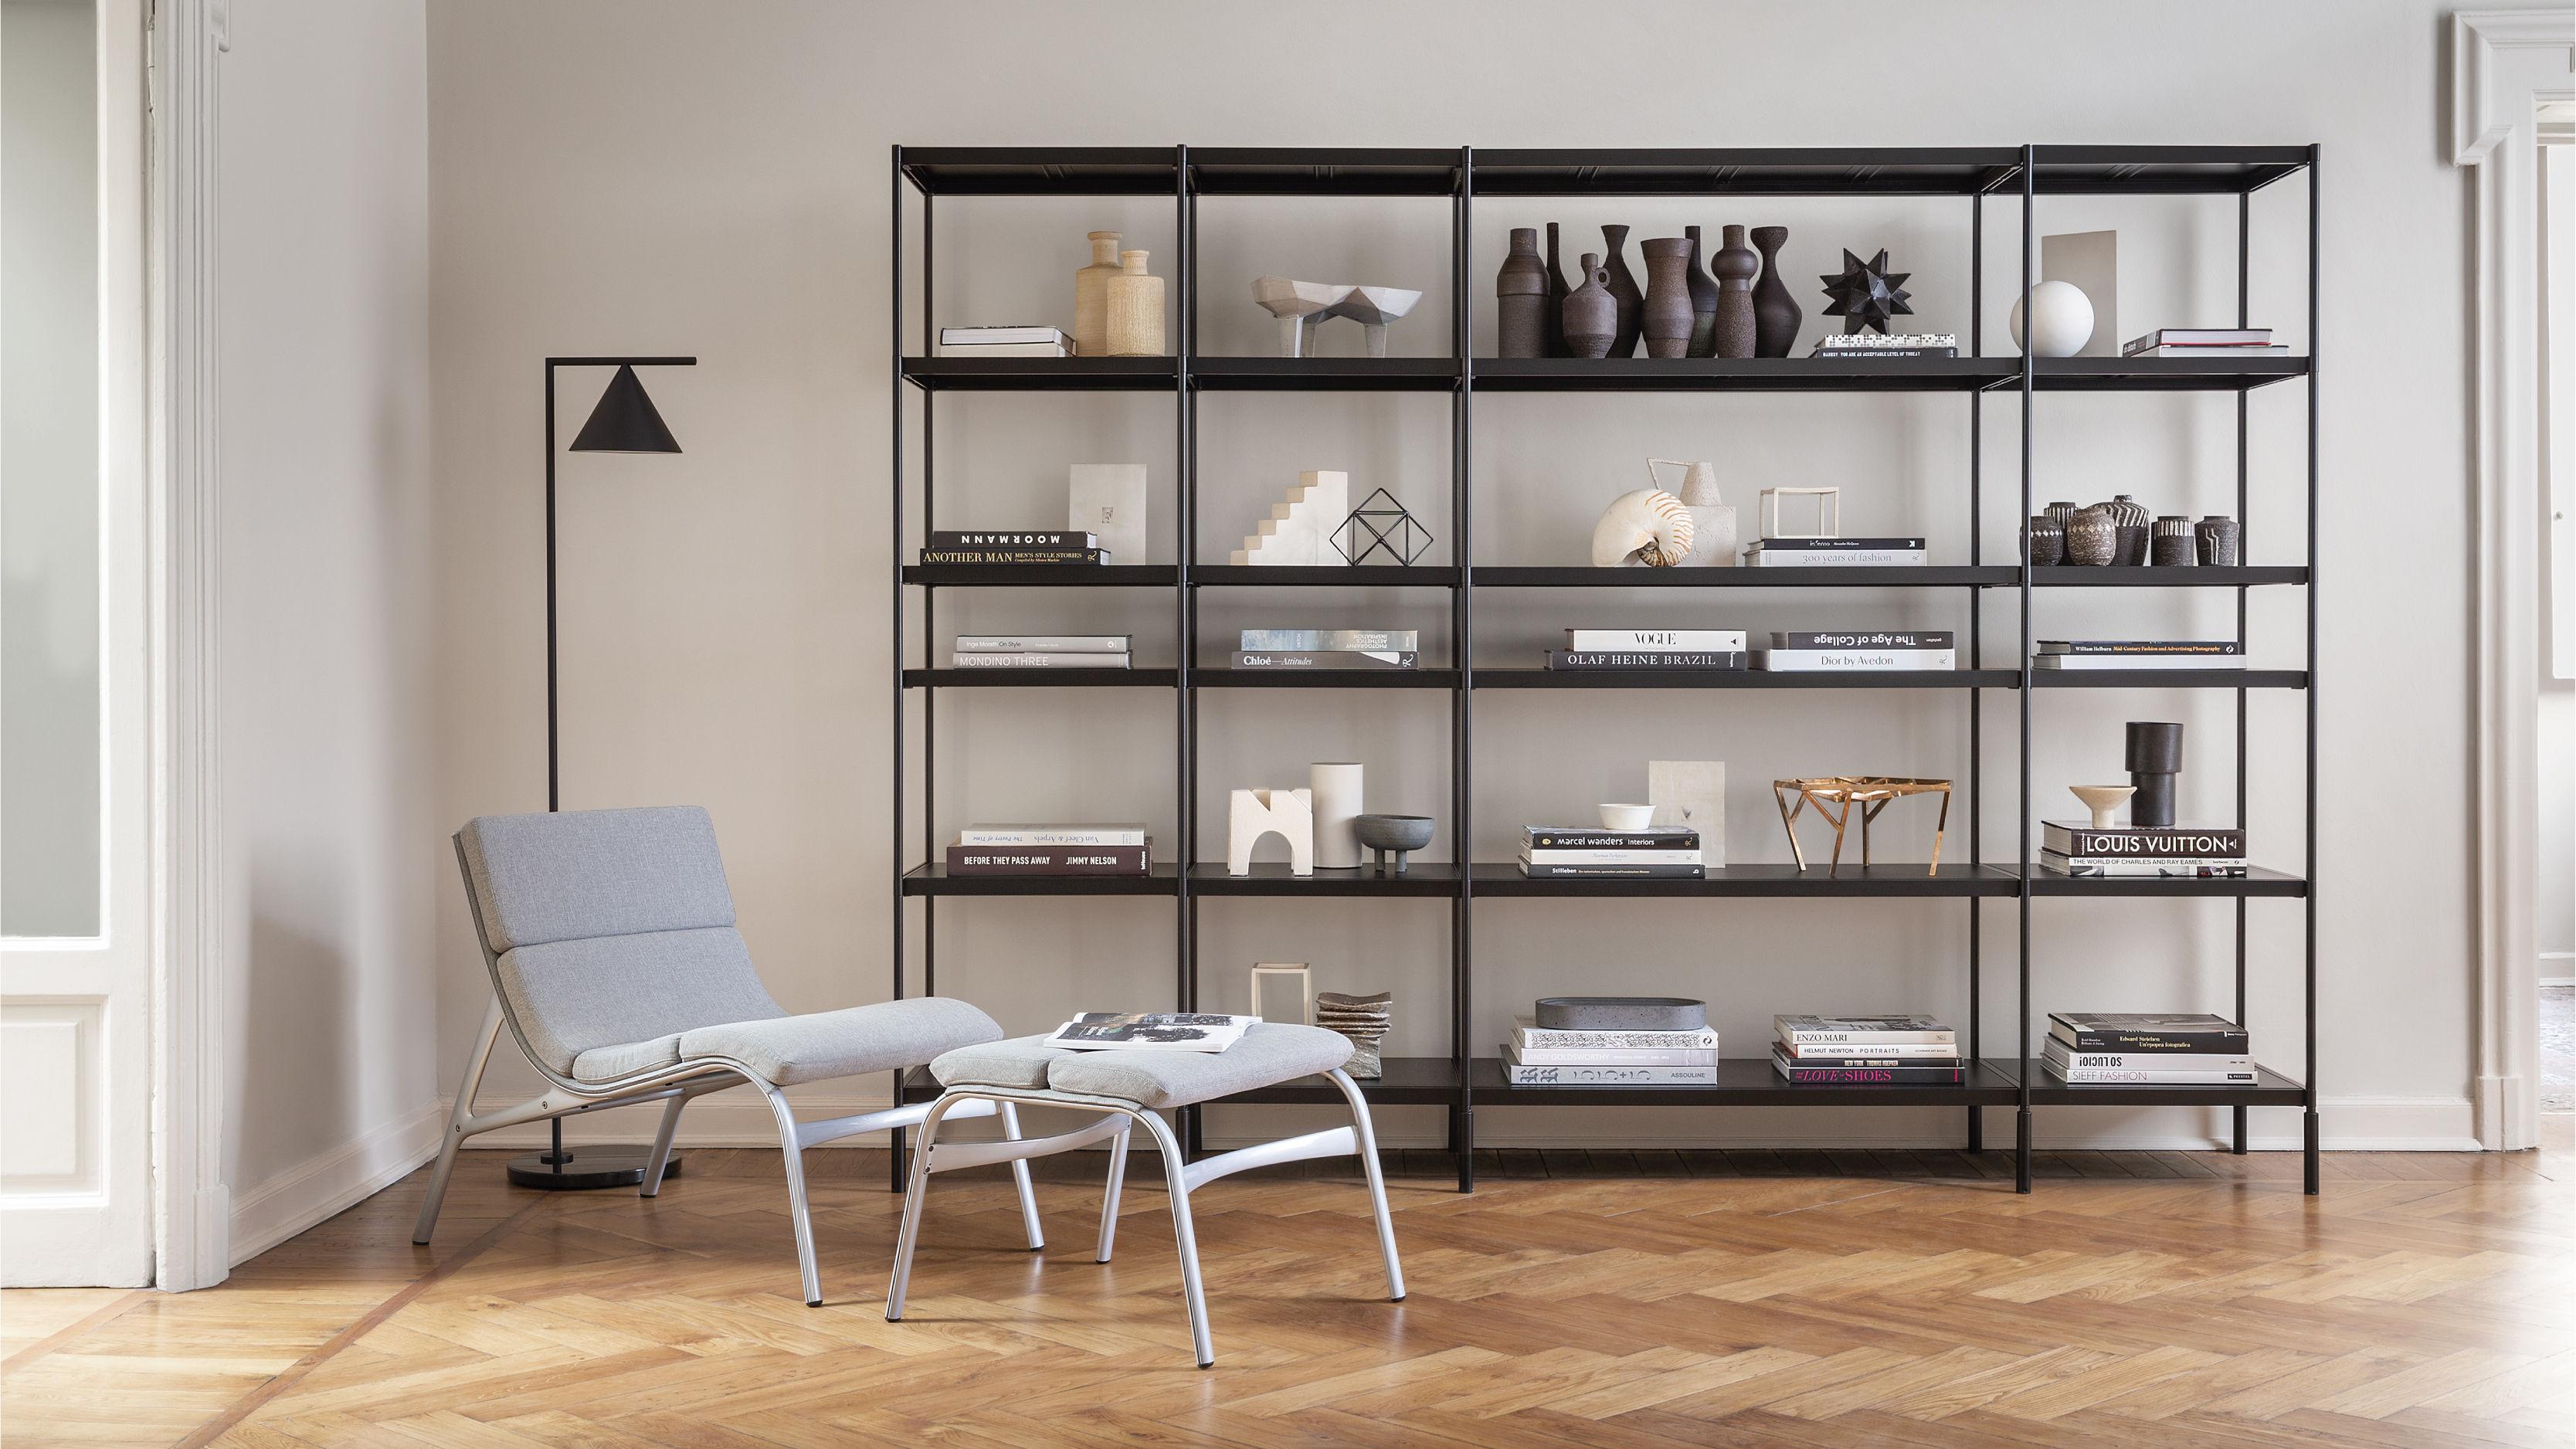 Legnoletto 160 bed